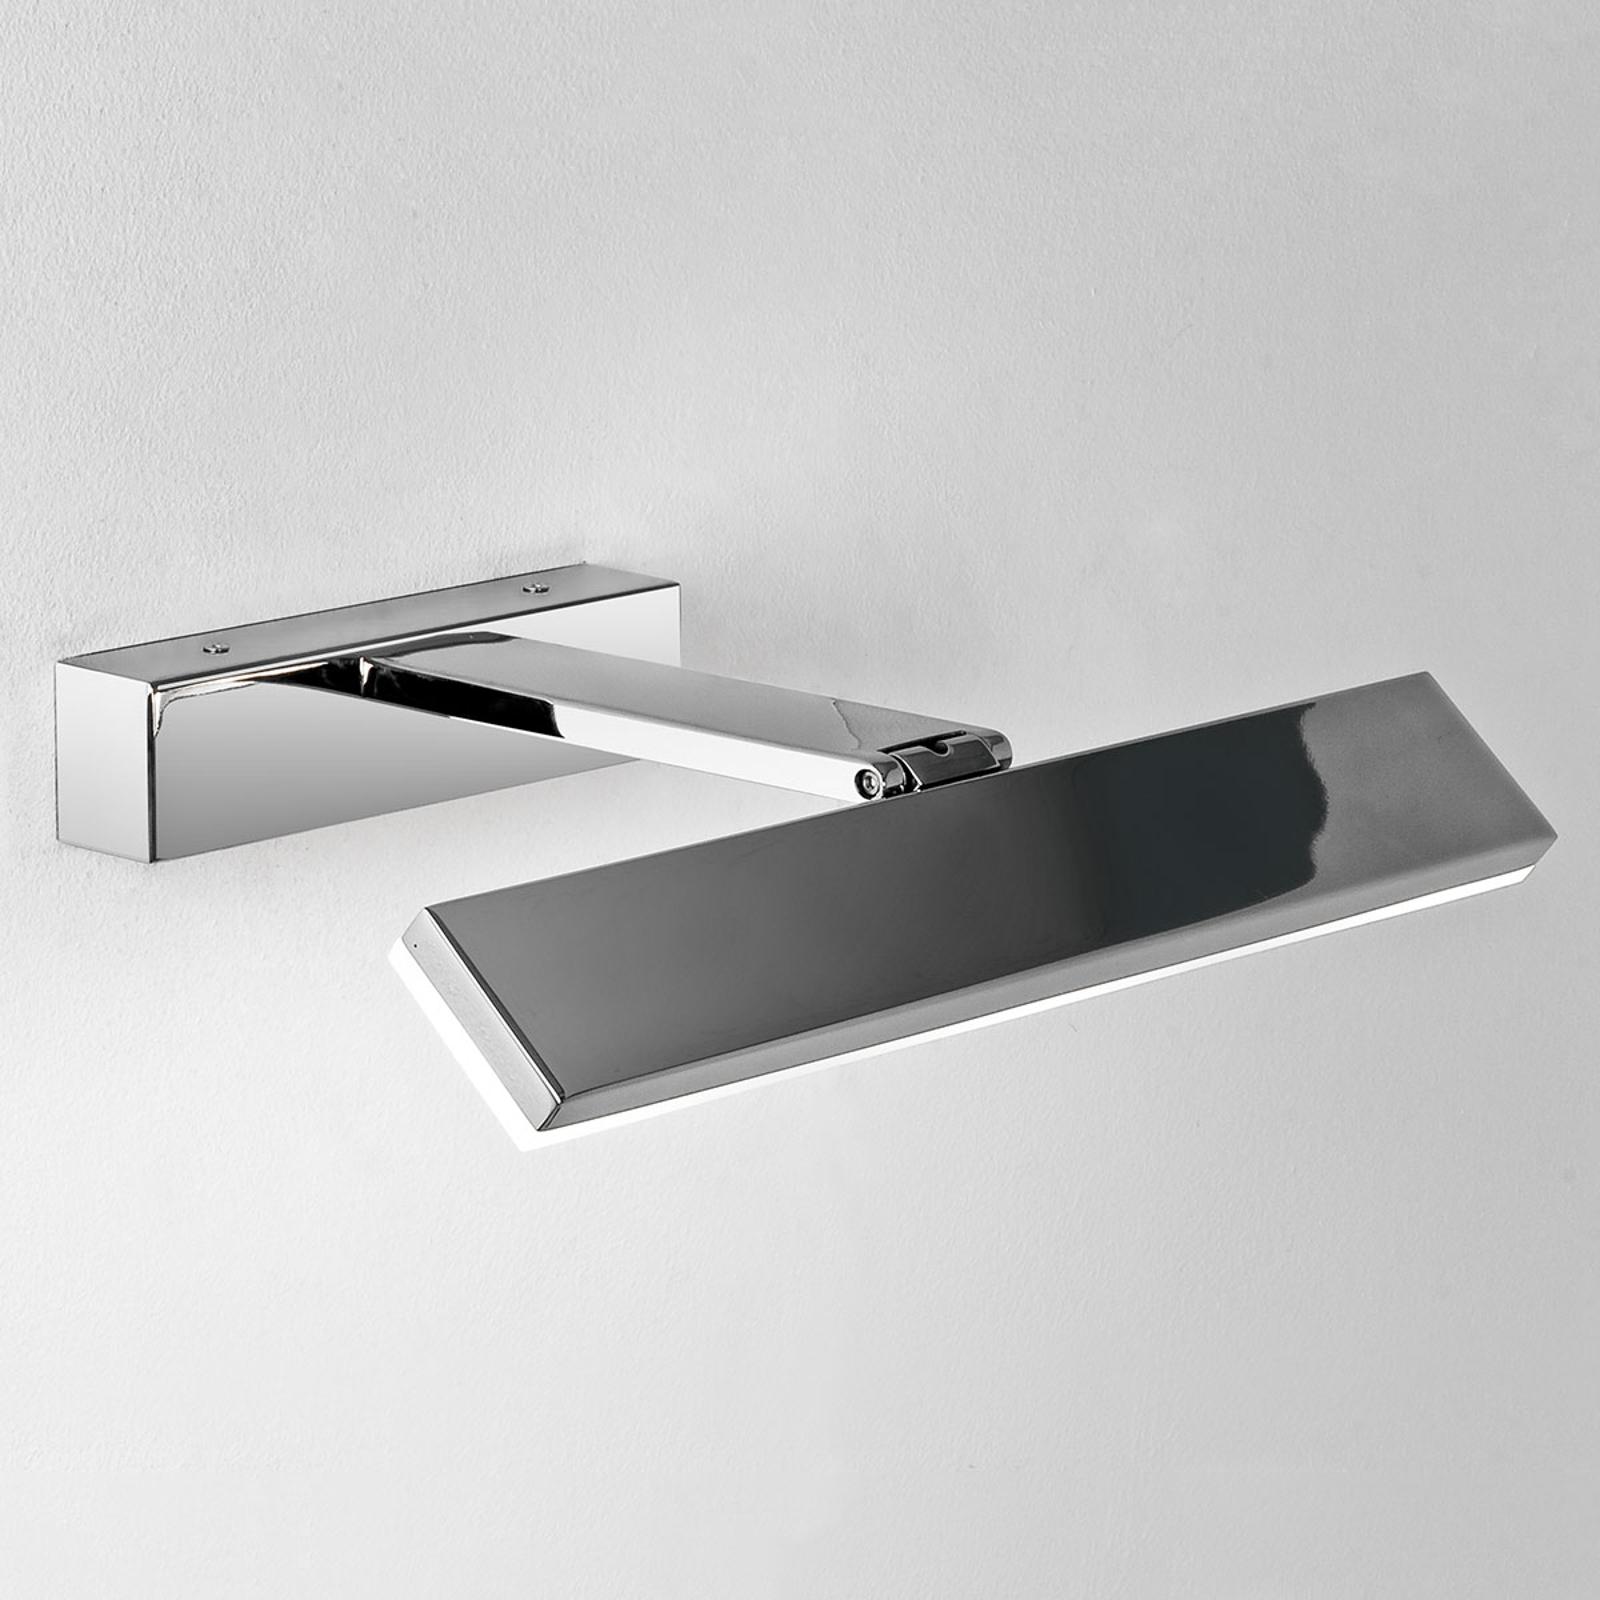 Zip LED Wall Light Innovative_1020386_1